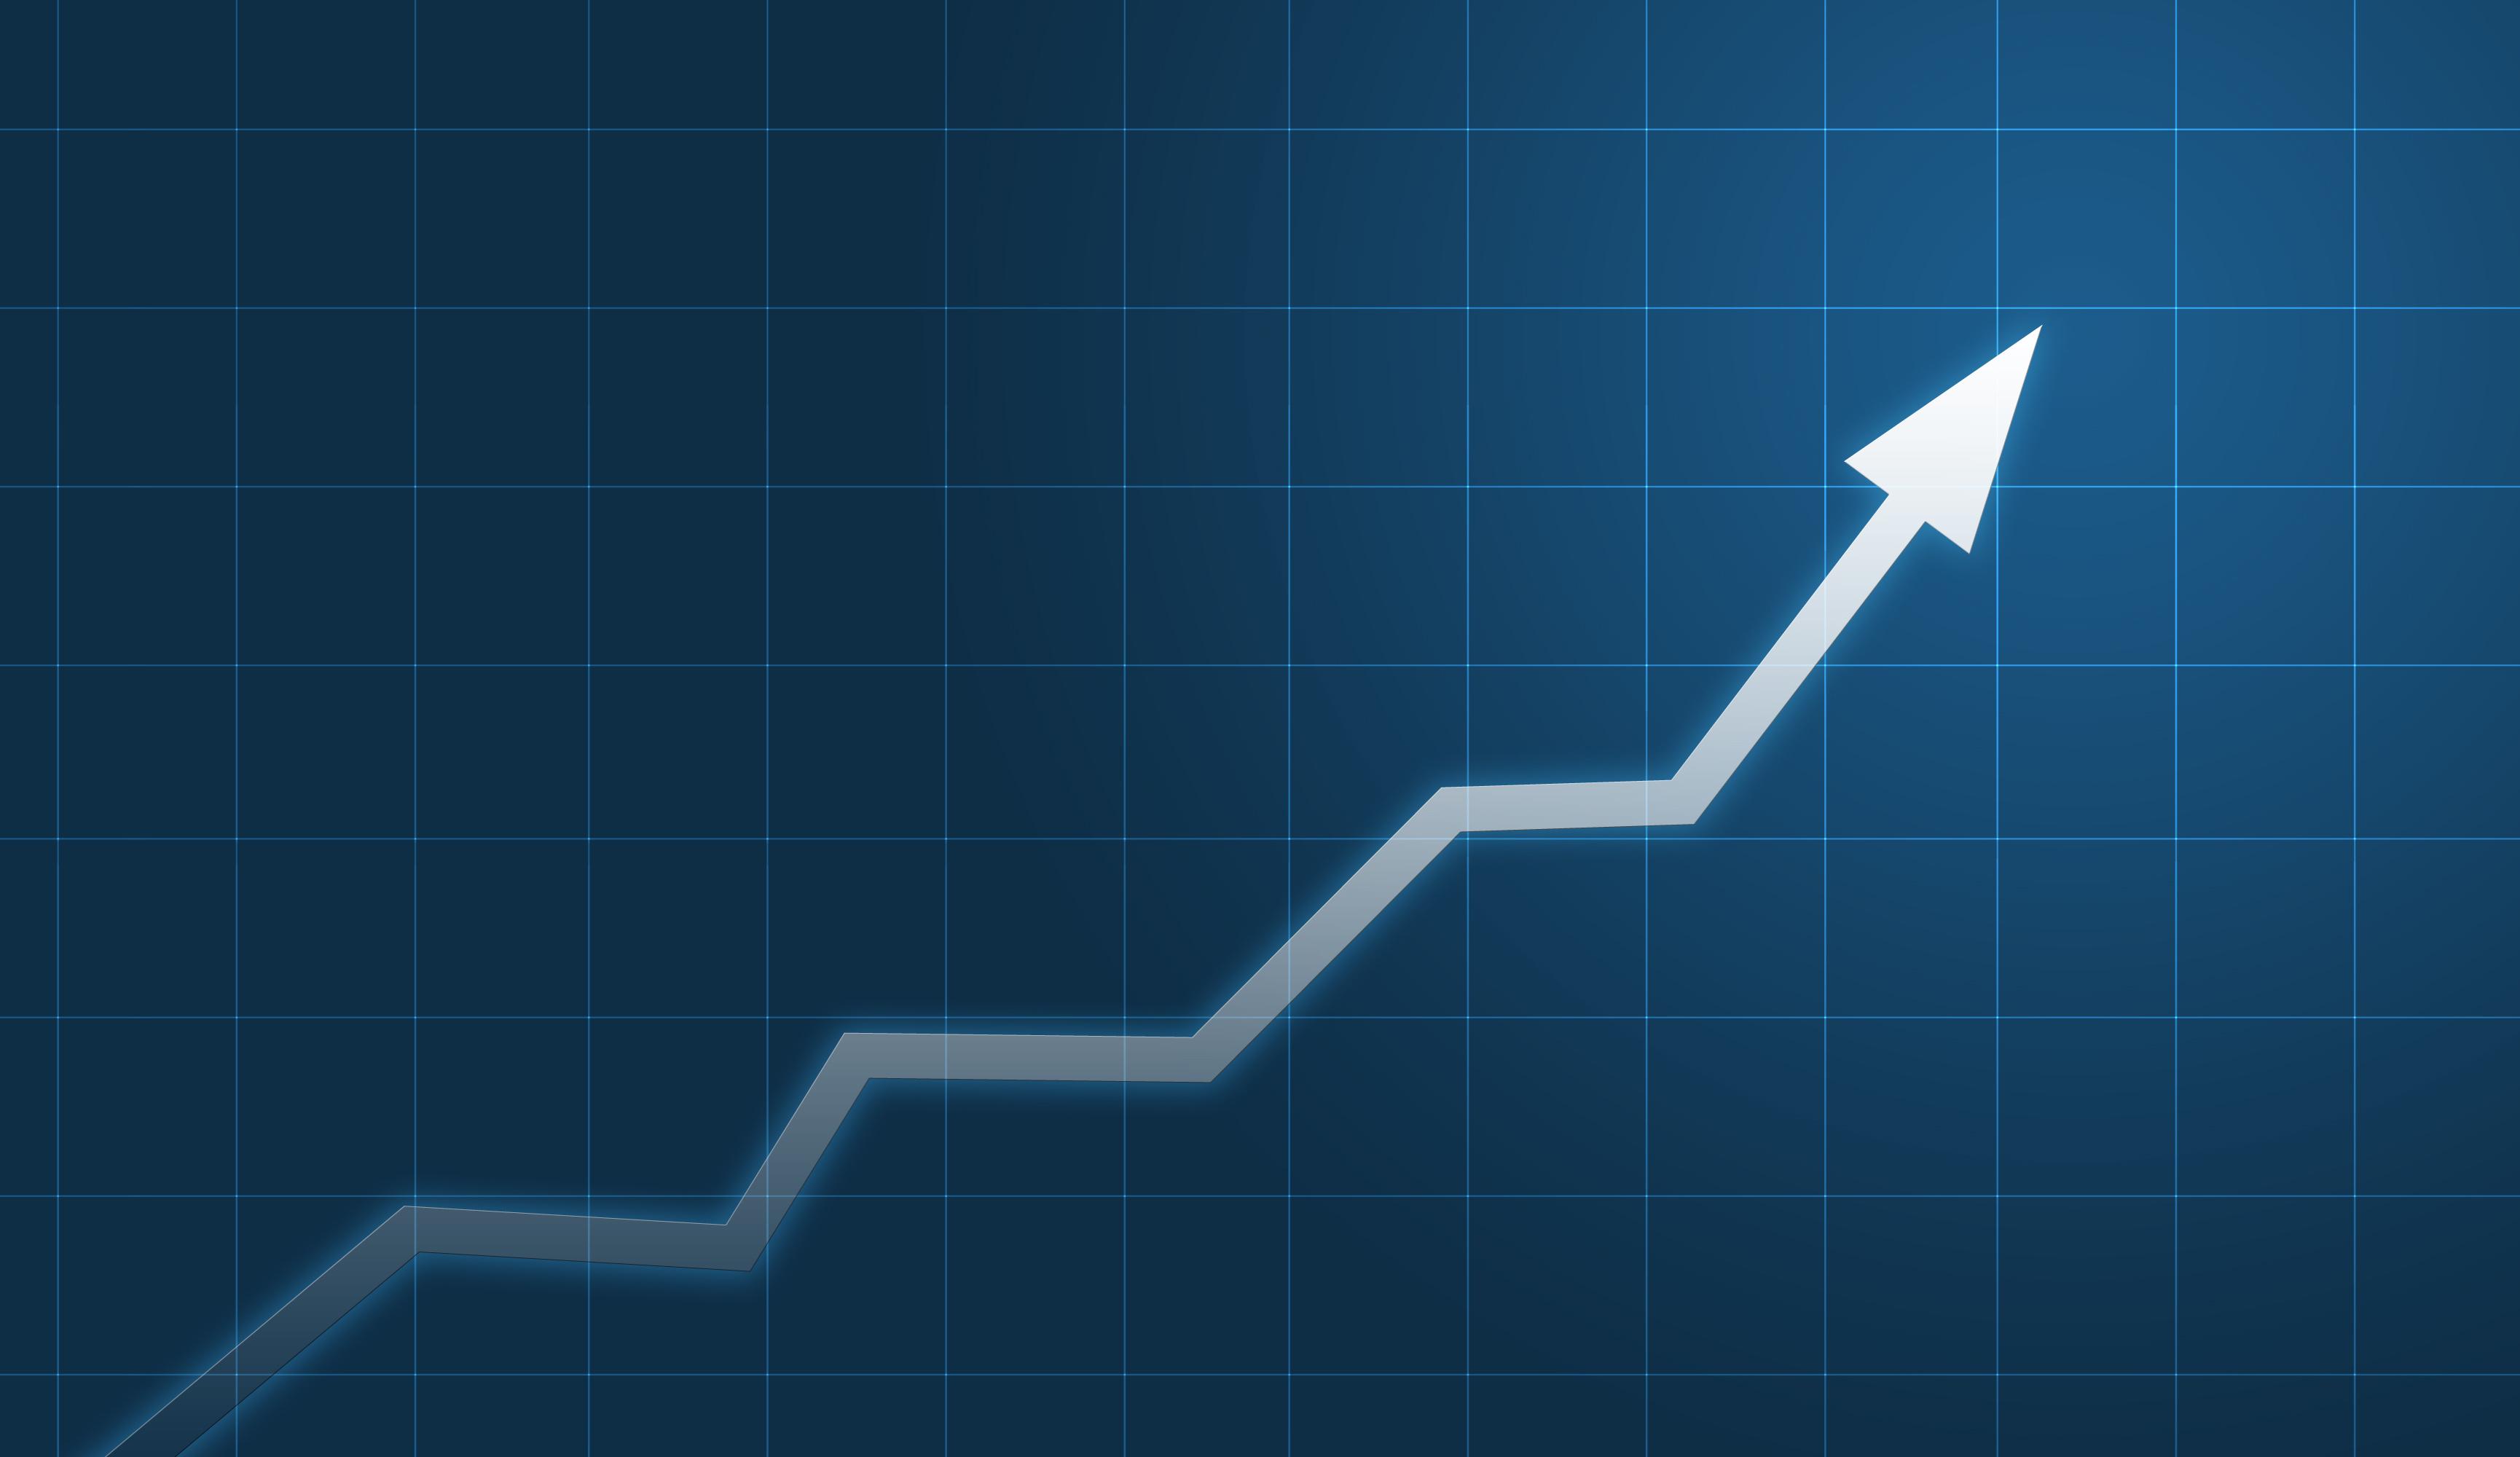 002 grow business